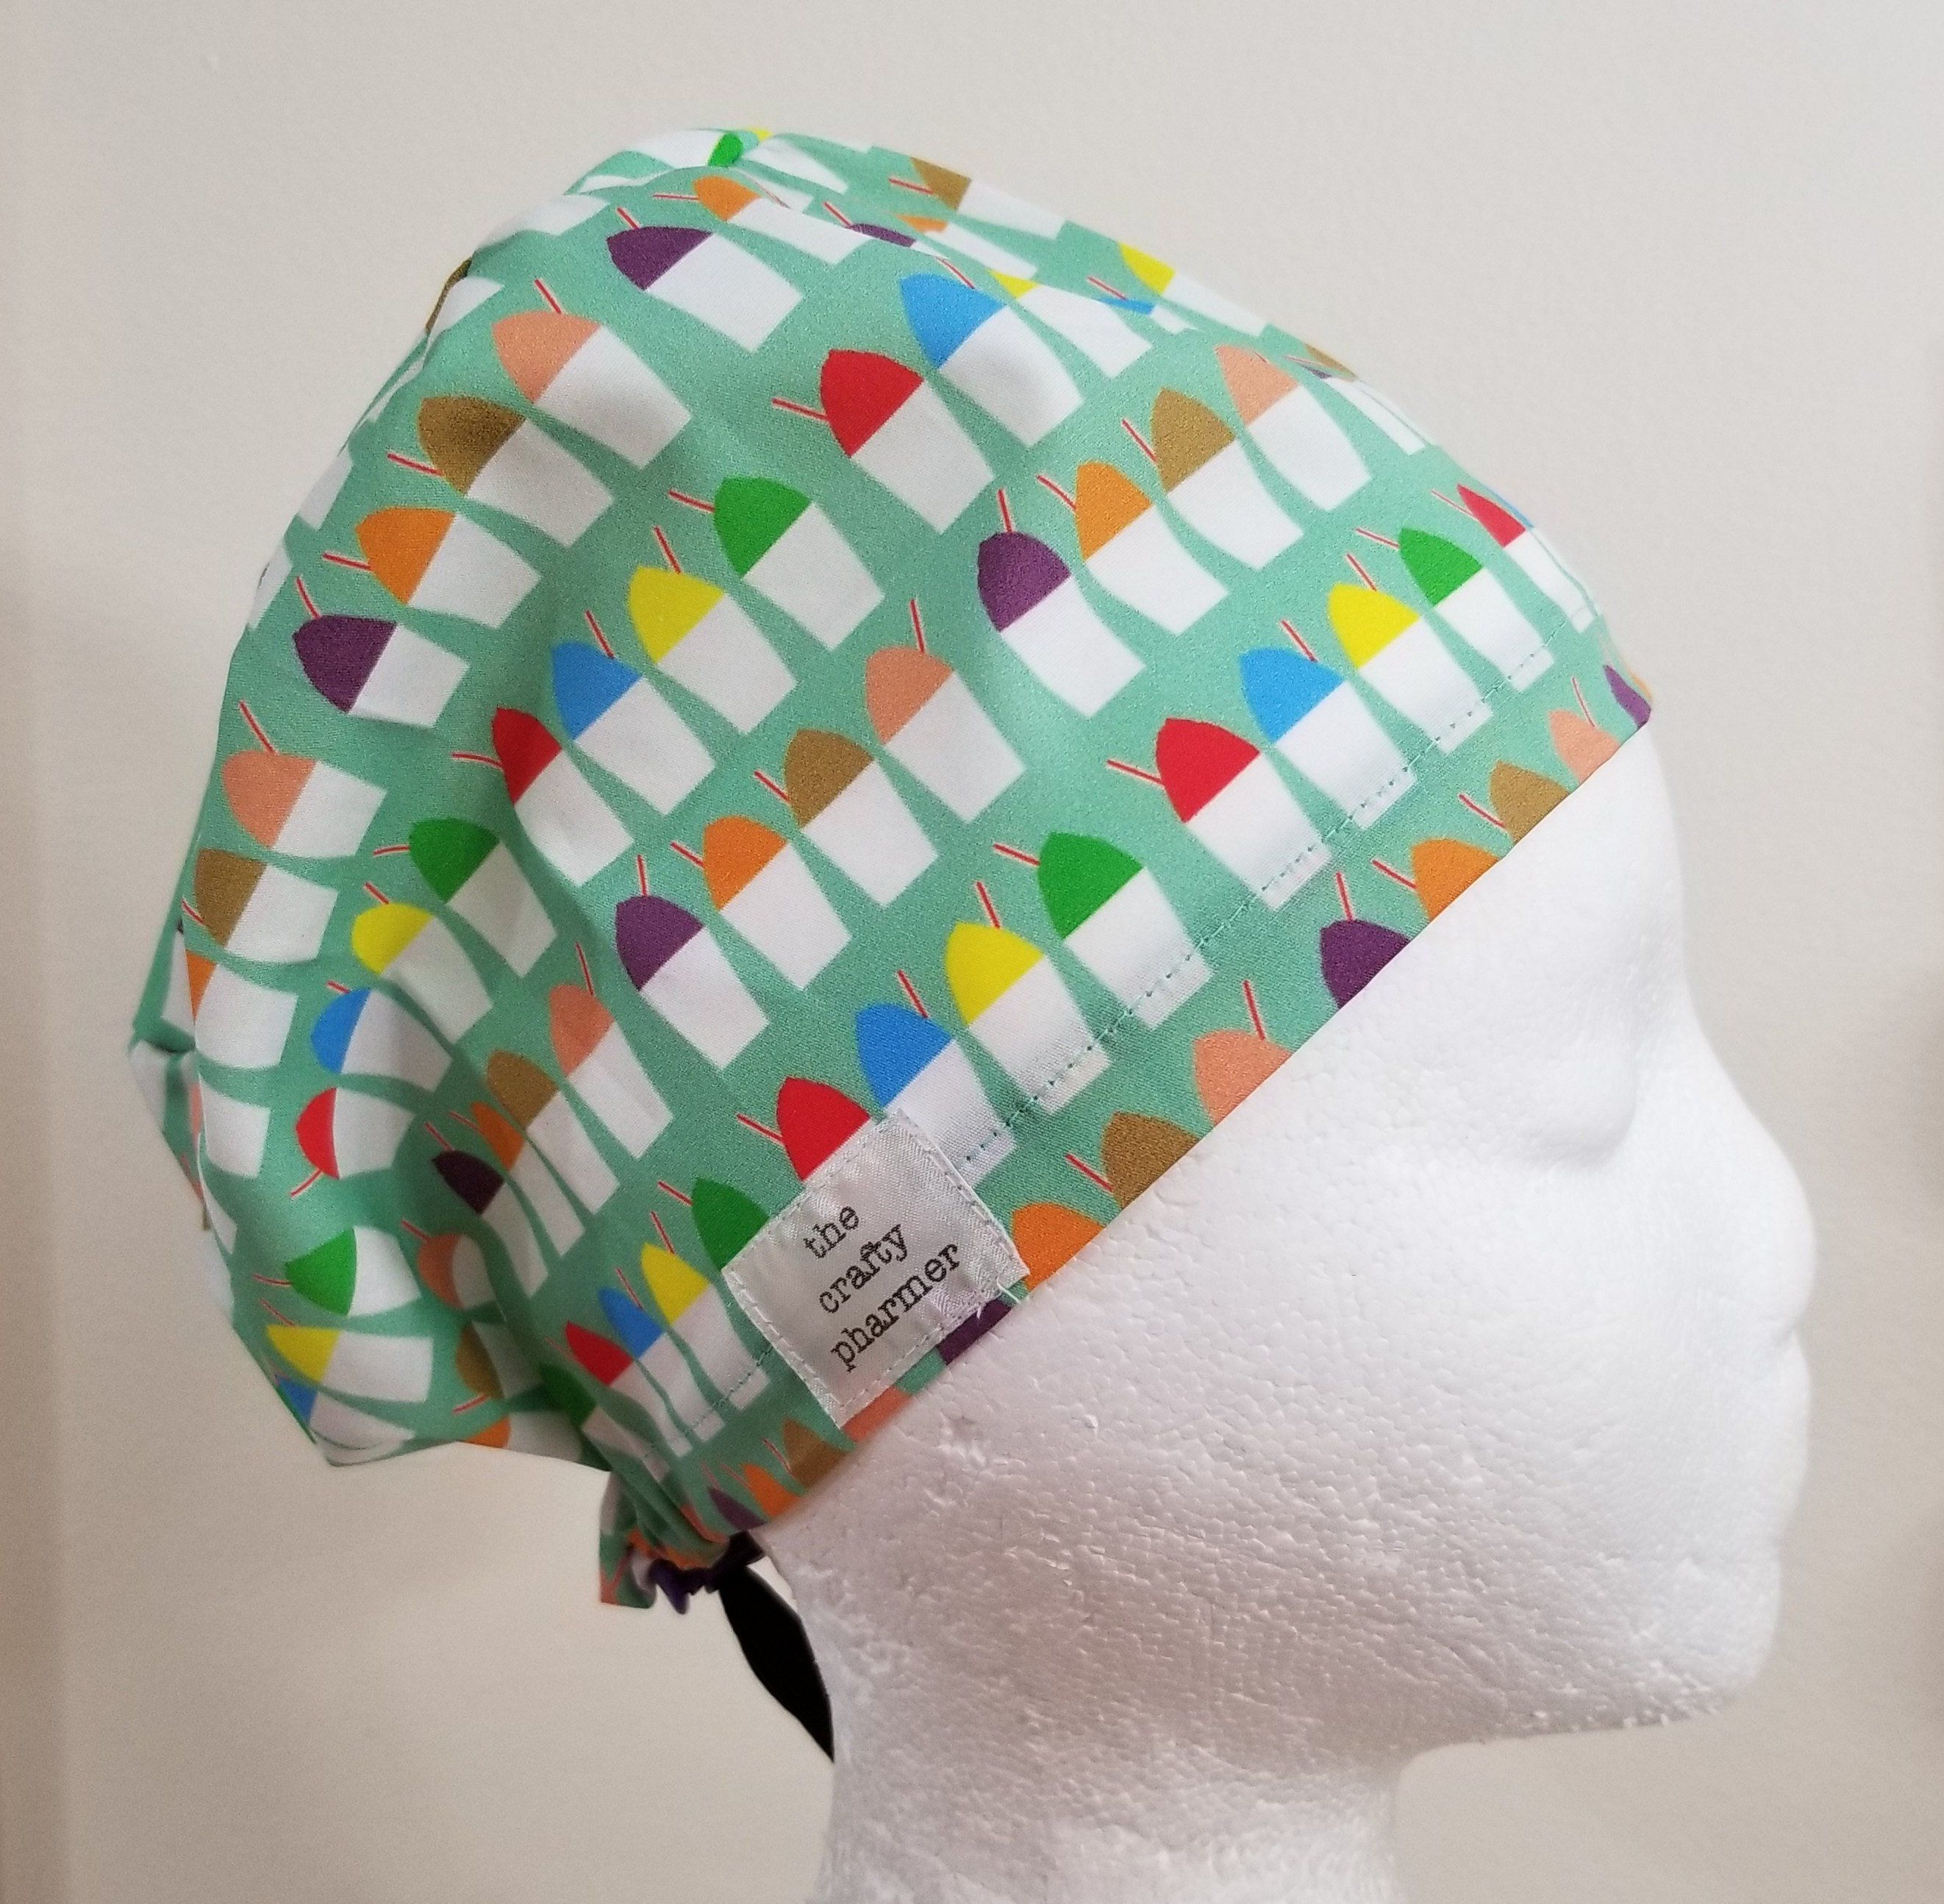 9e46f54c66b0e NOLA Sno Balls - Handmade Scrub Hats